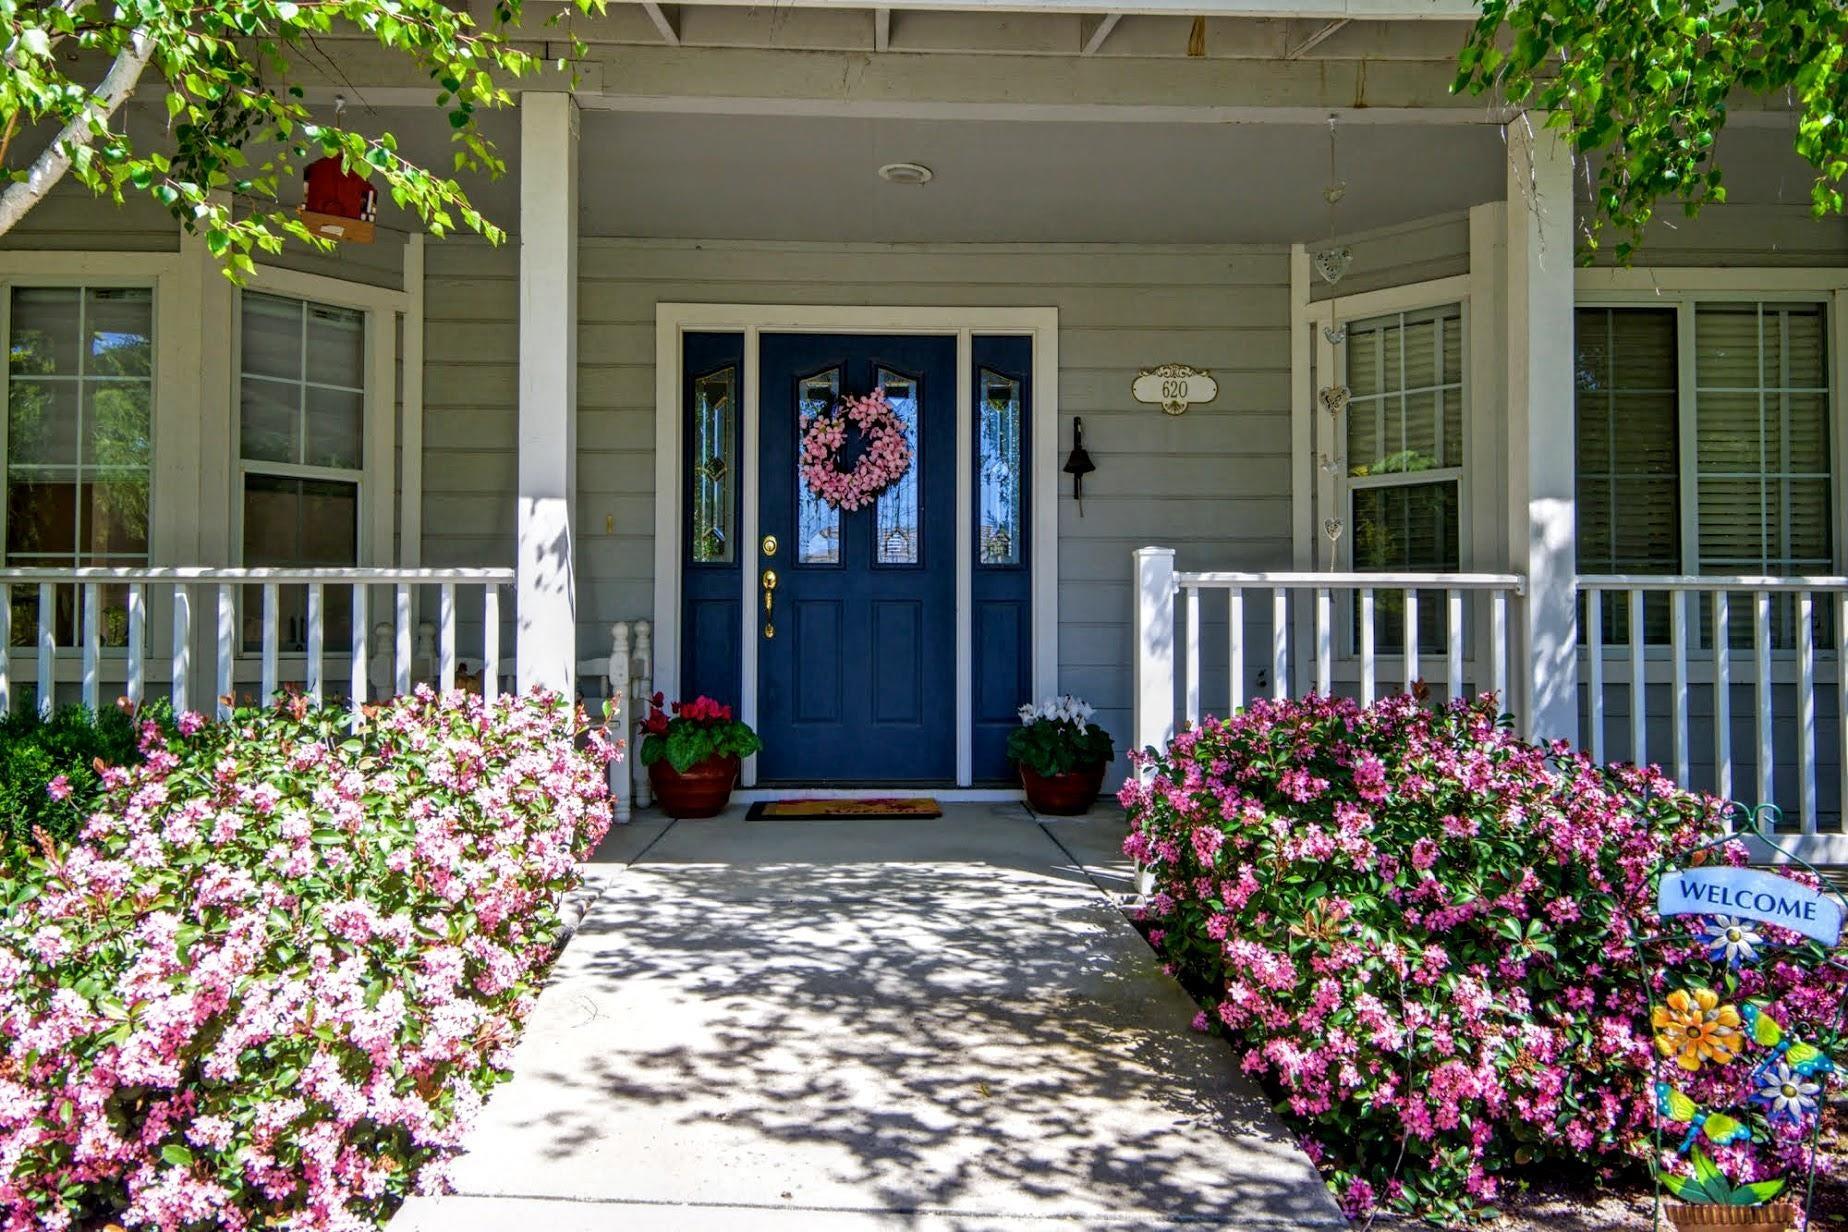 Home on Foxen Lane